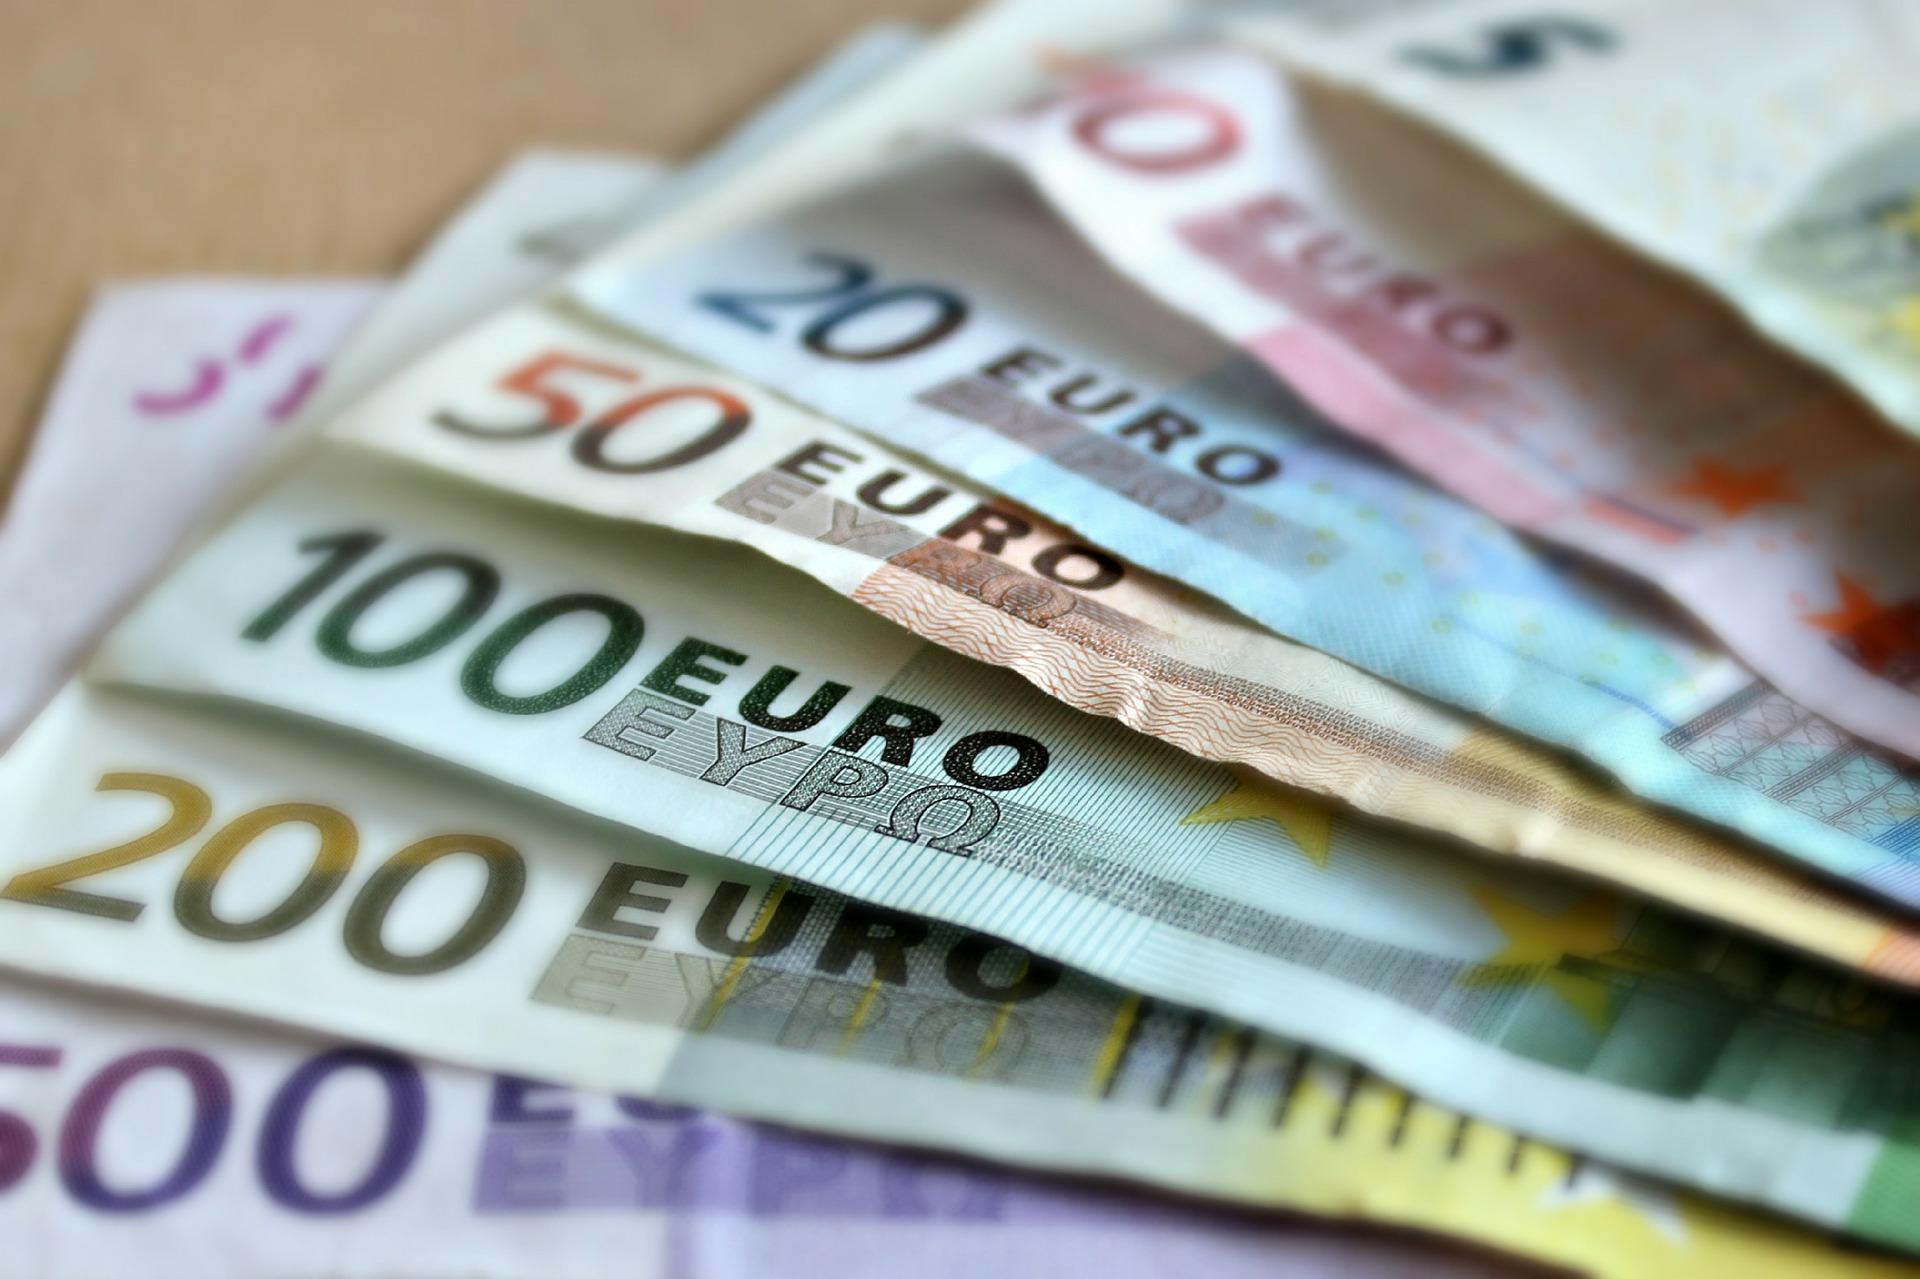 Казахстан разместил два транша евробондов на 1,15 млрд евро